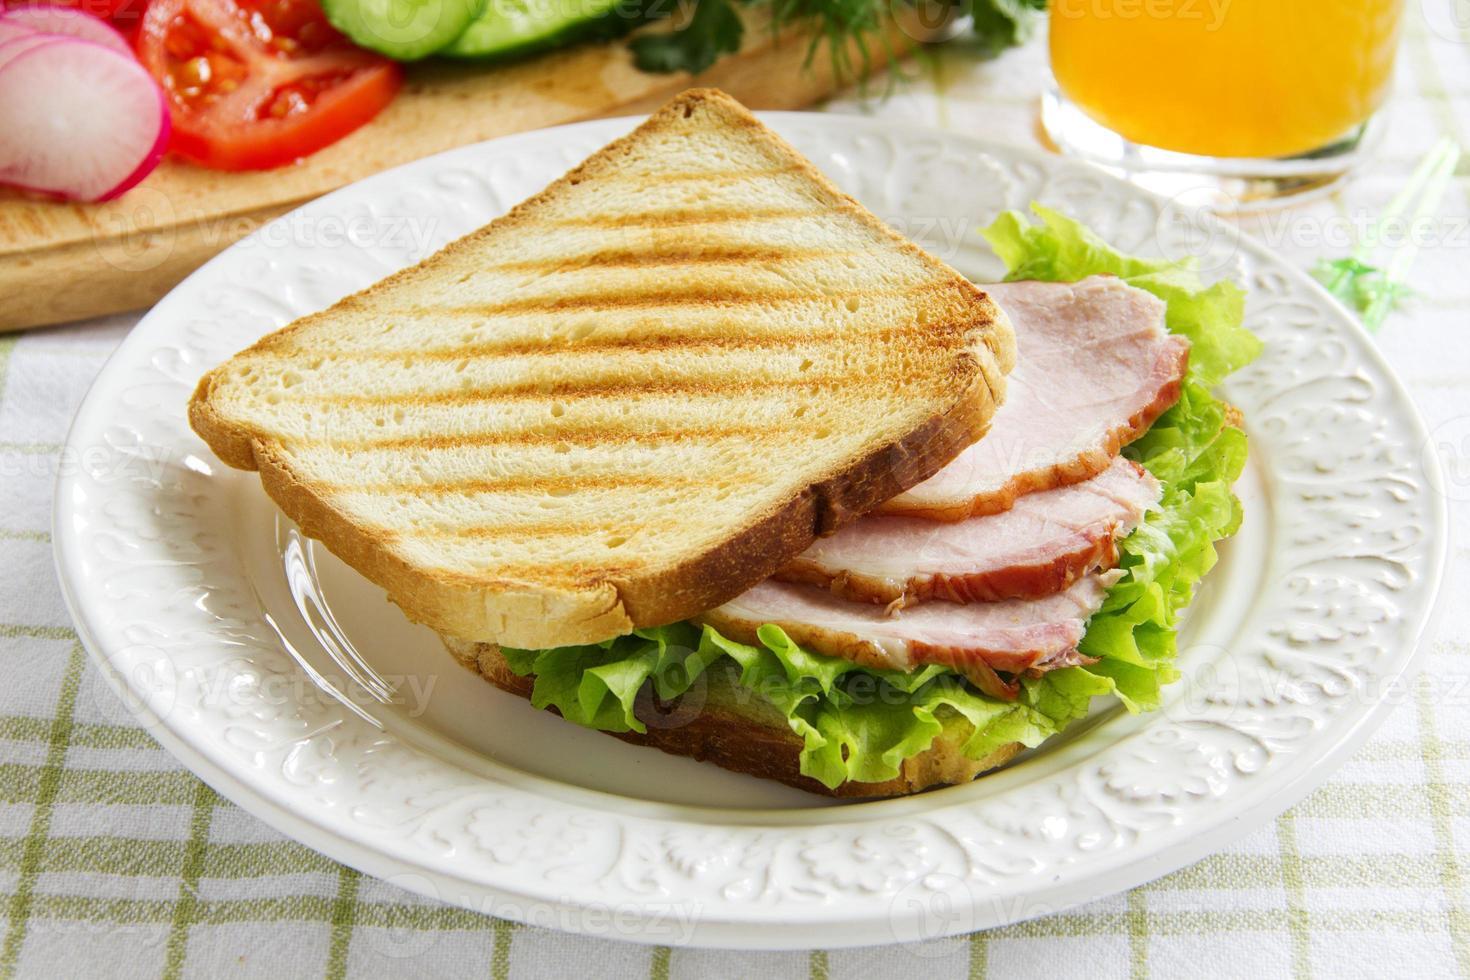 panino con verdure rotbifom ... foto